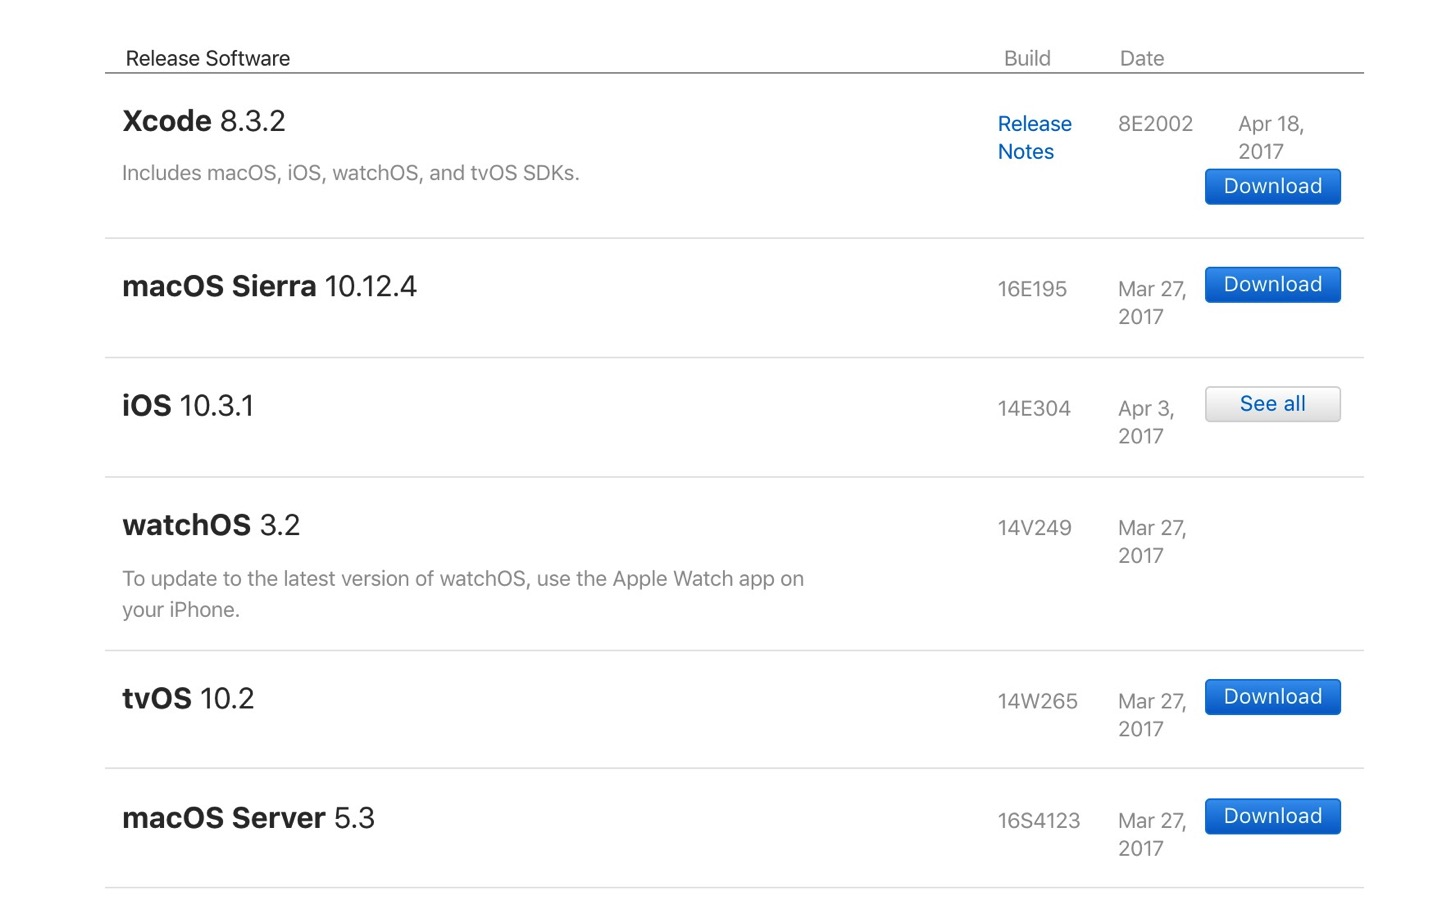 XcodeのApp Store以外のダウンロード先。